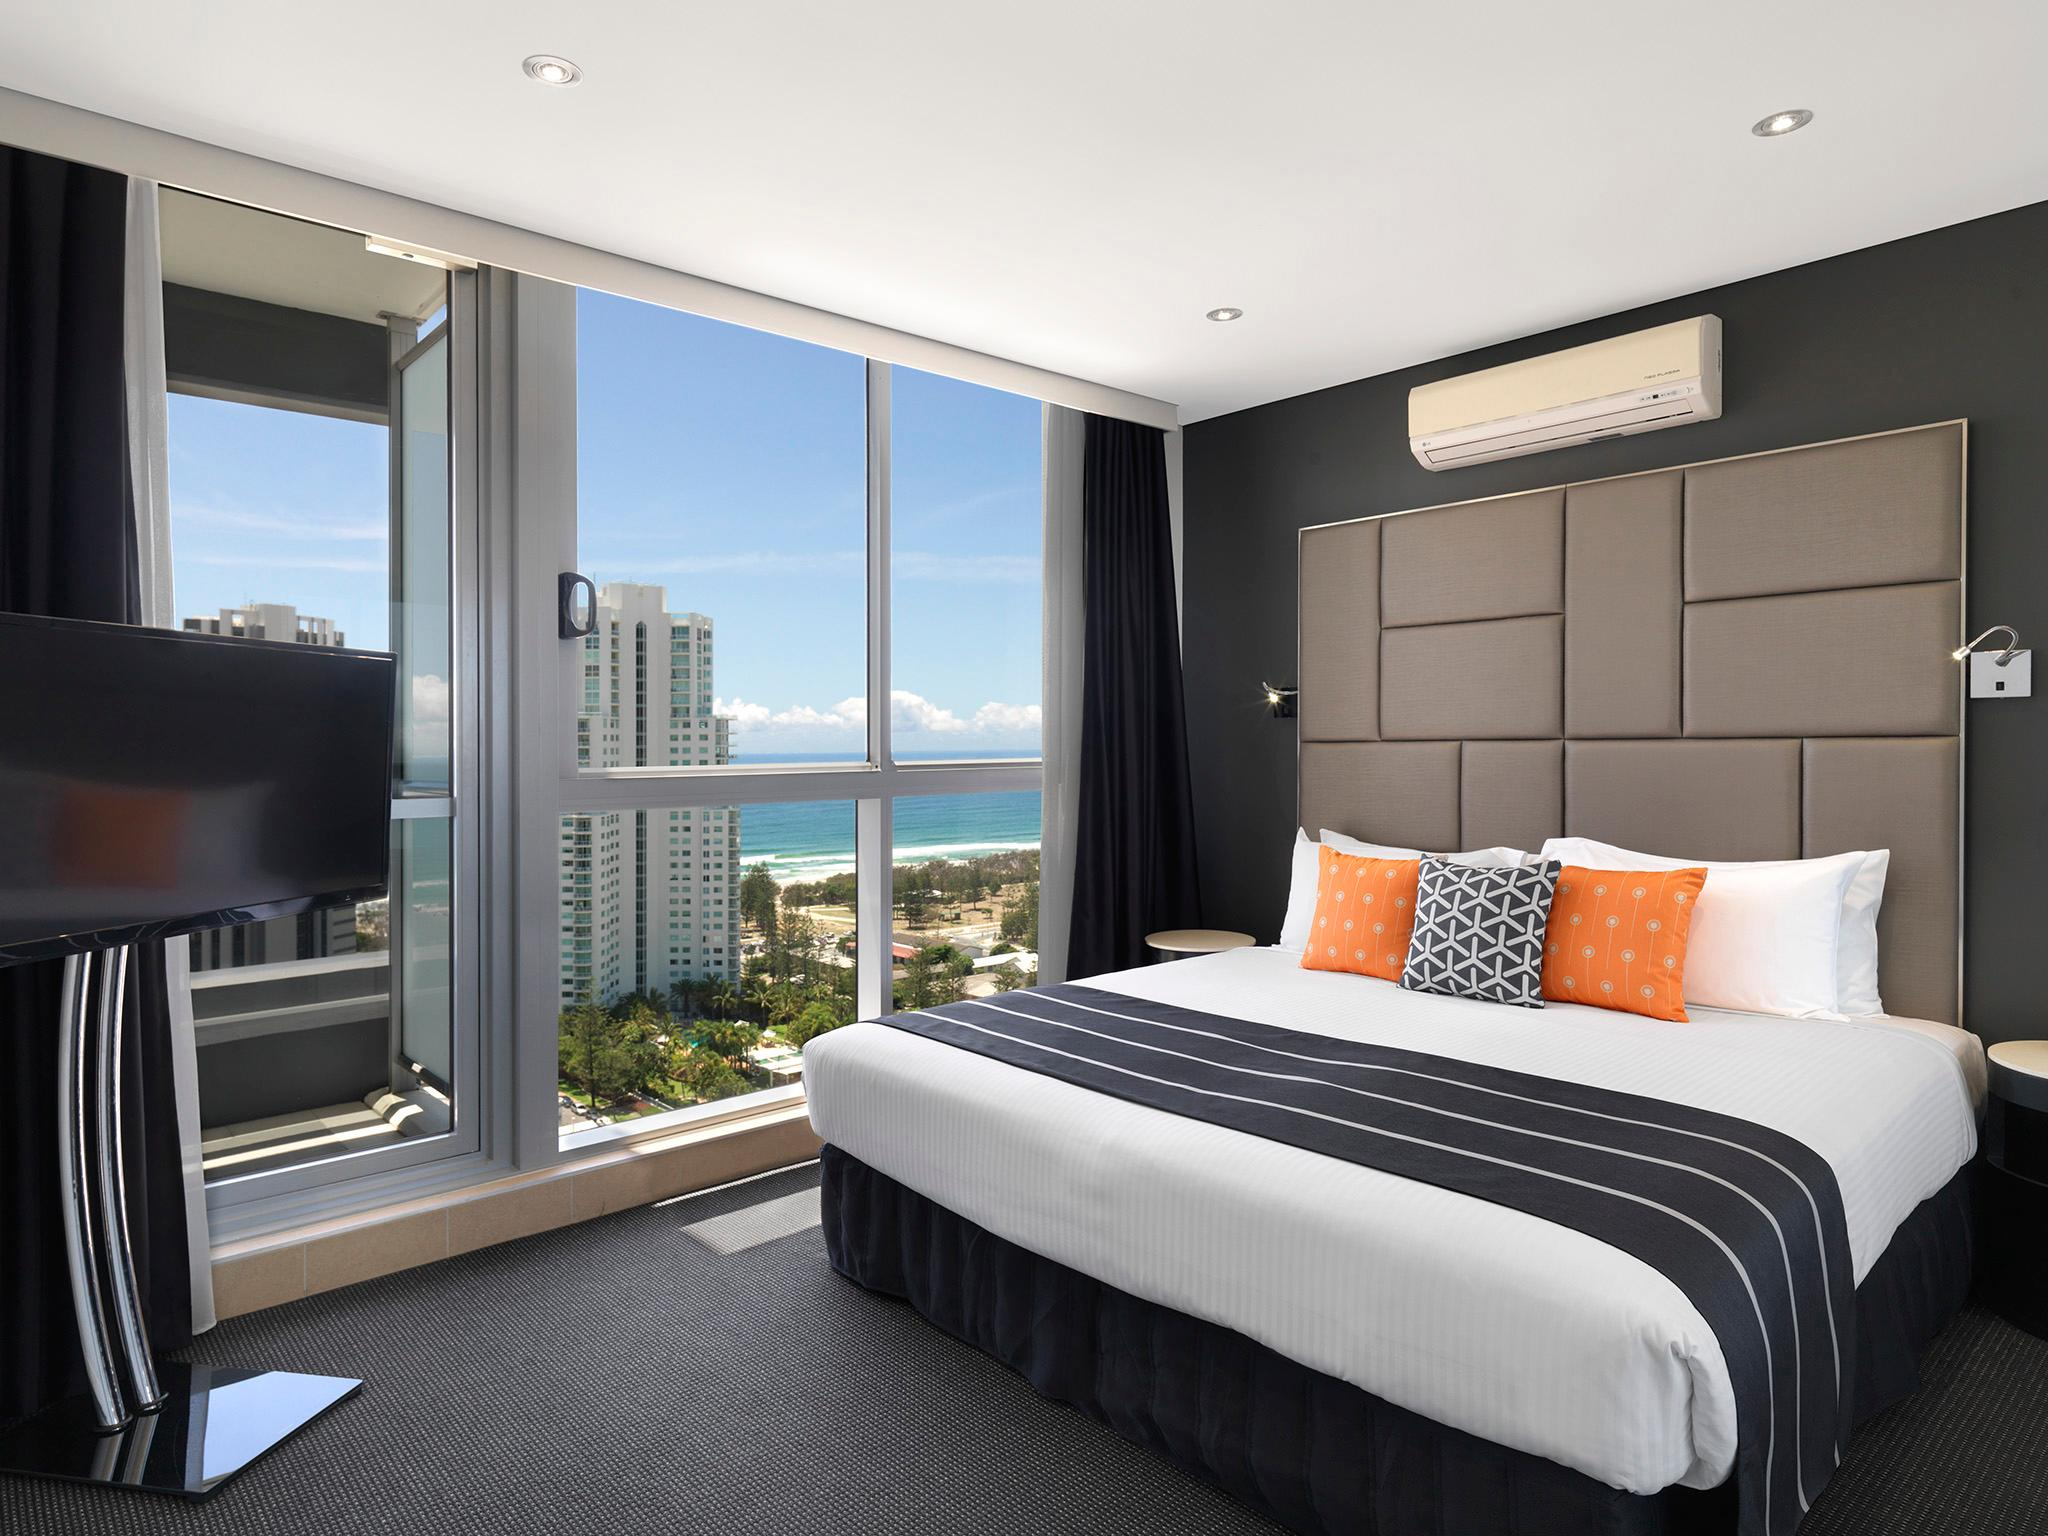 Meriton Serviced Apartments - Broadbeach - Hotell och Boende i Australien , Guldkusten